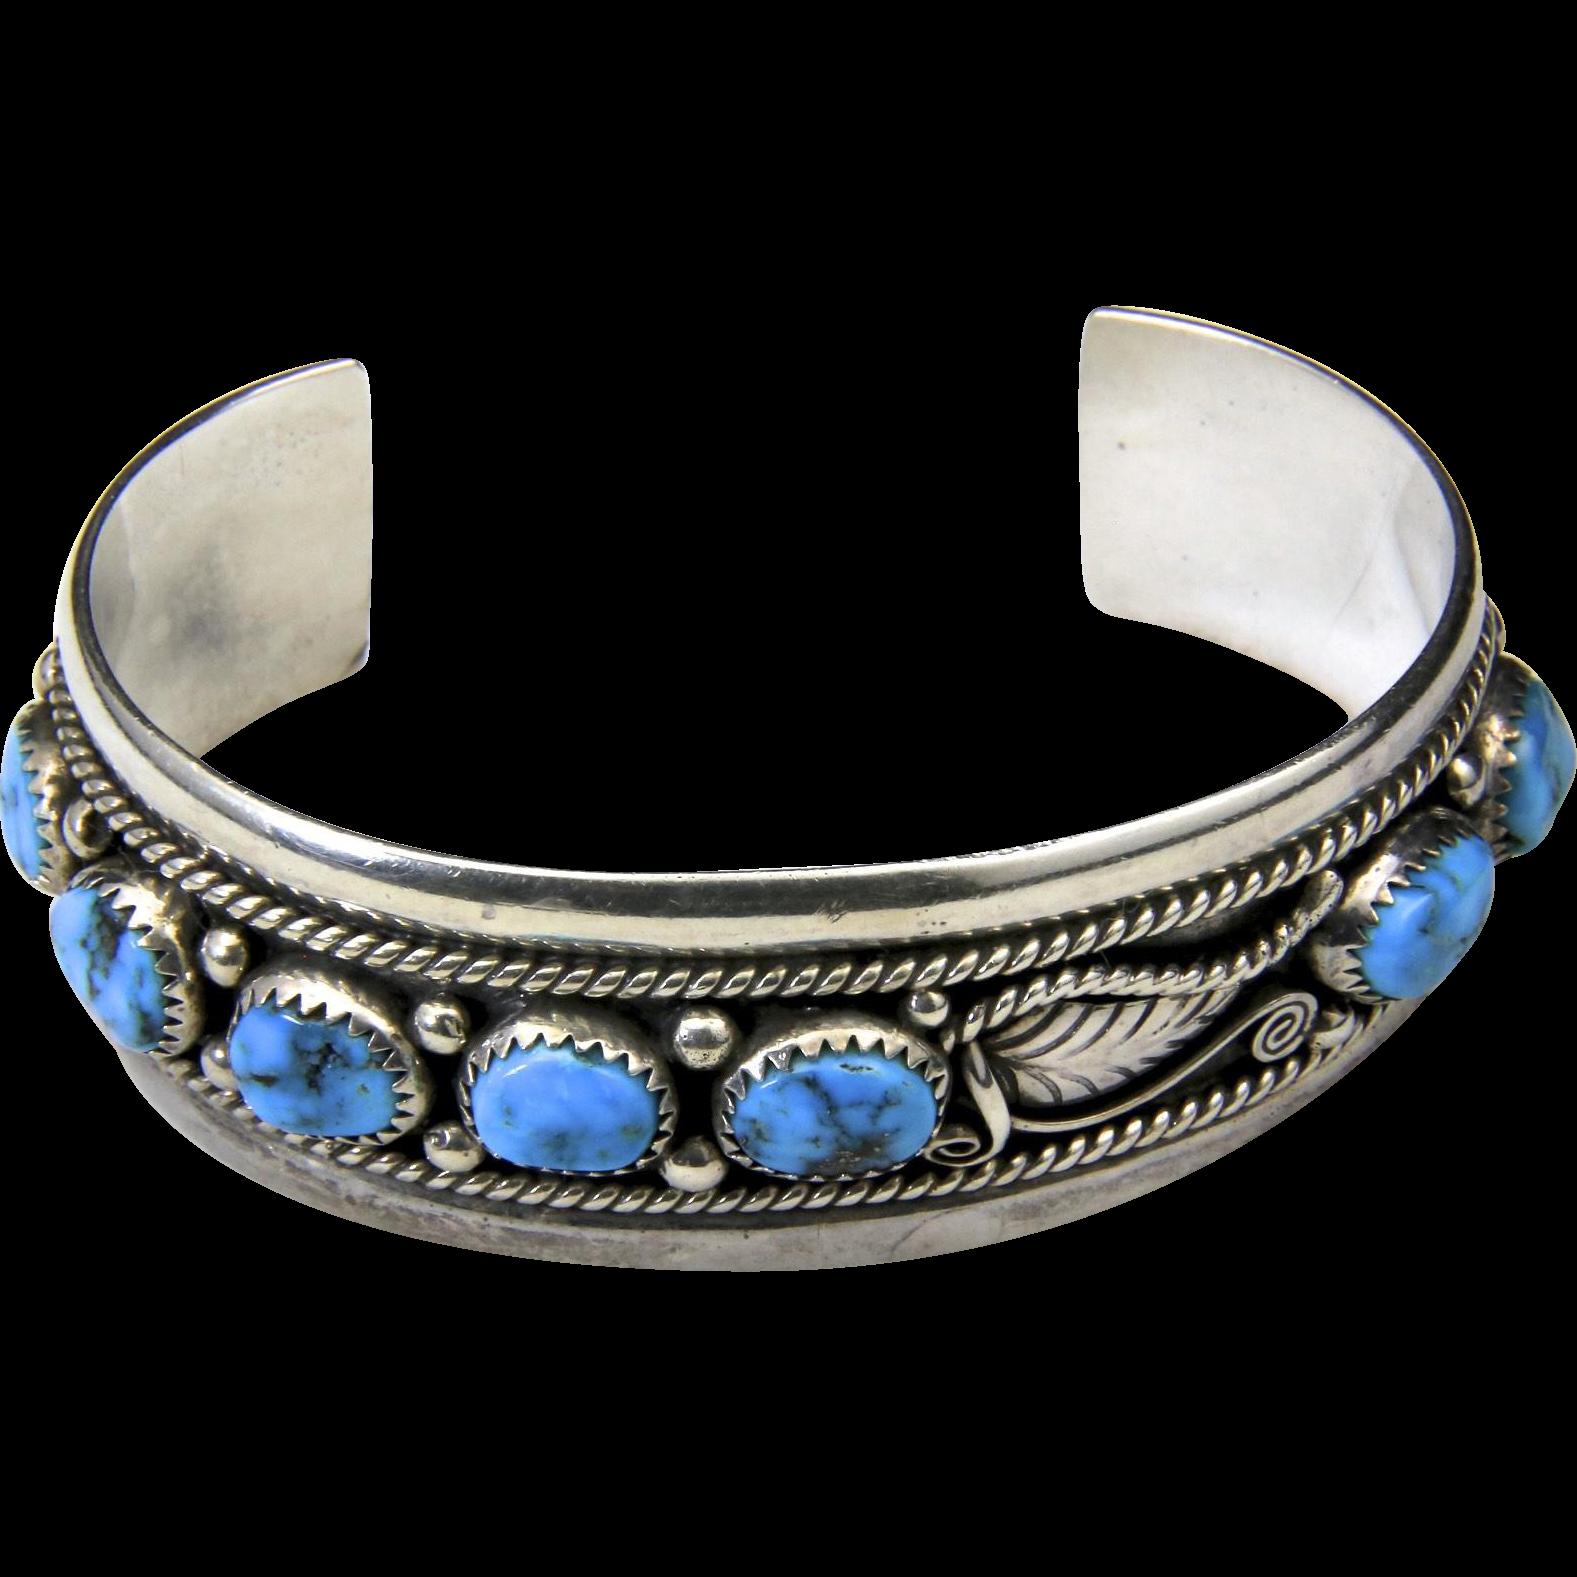 Vintage Heavy Sterling Silver & Multiple Turquoise Stone Cuff Bracelet Artisan